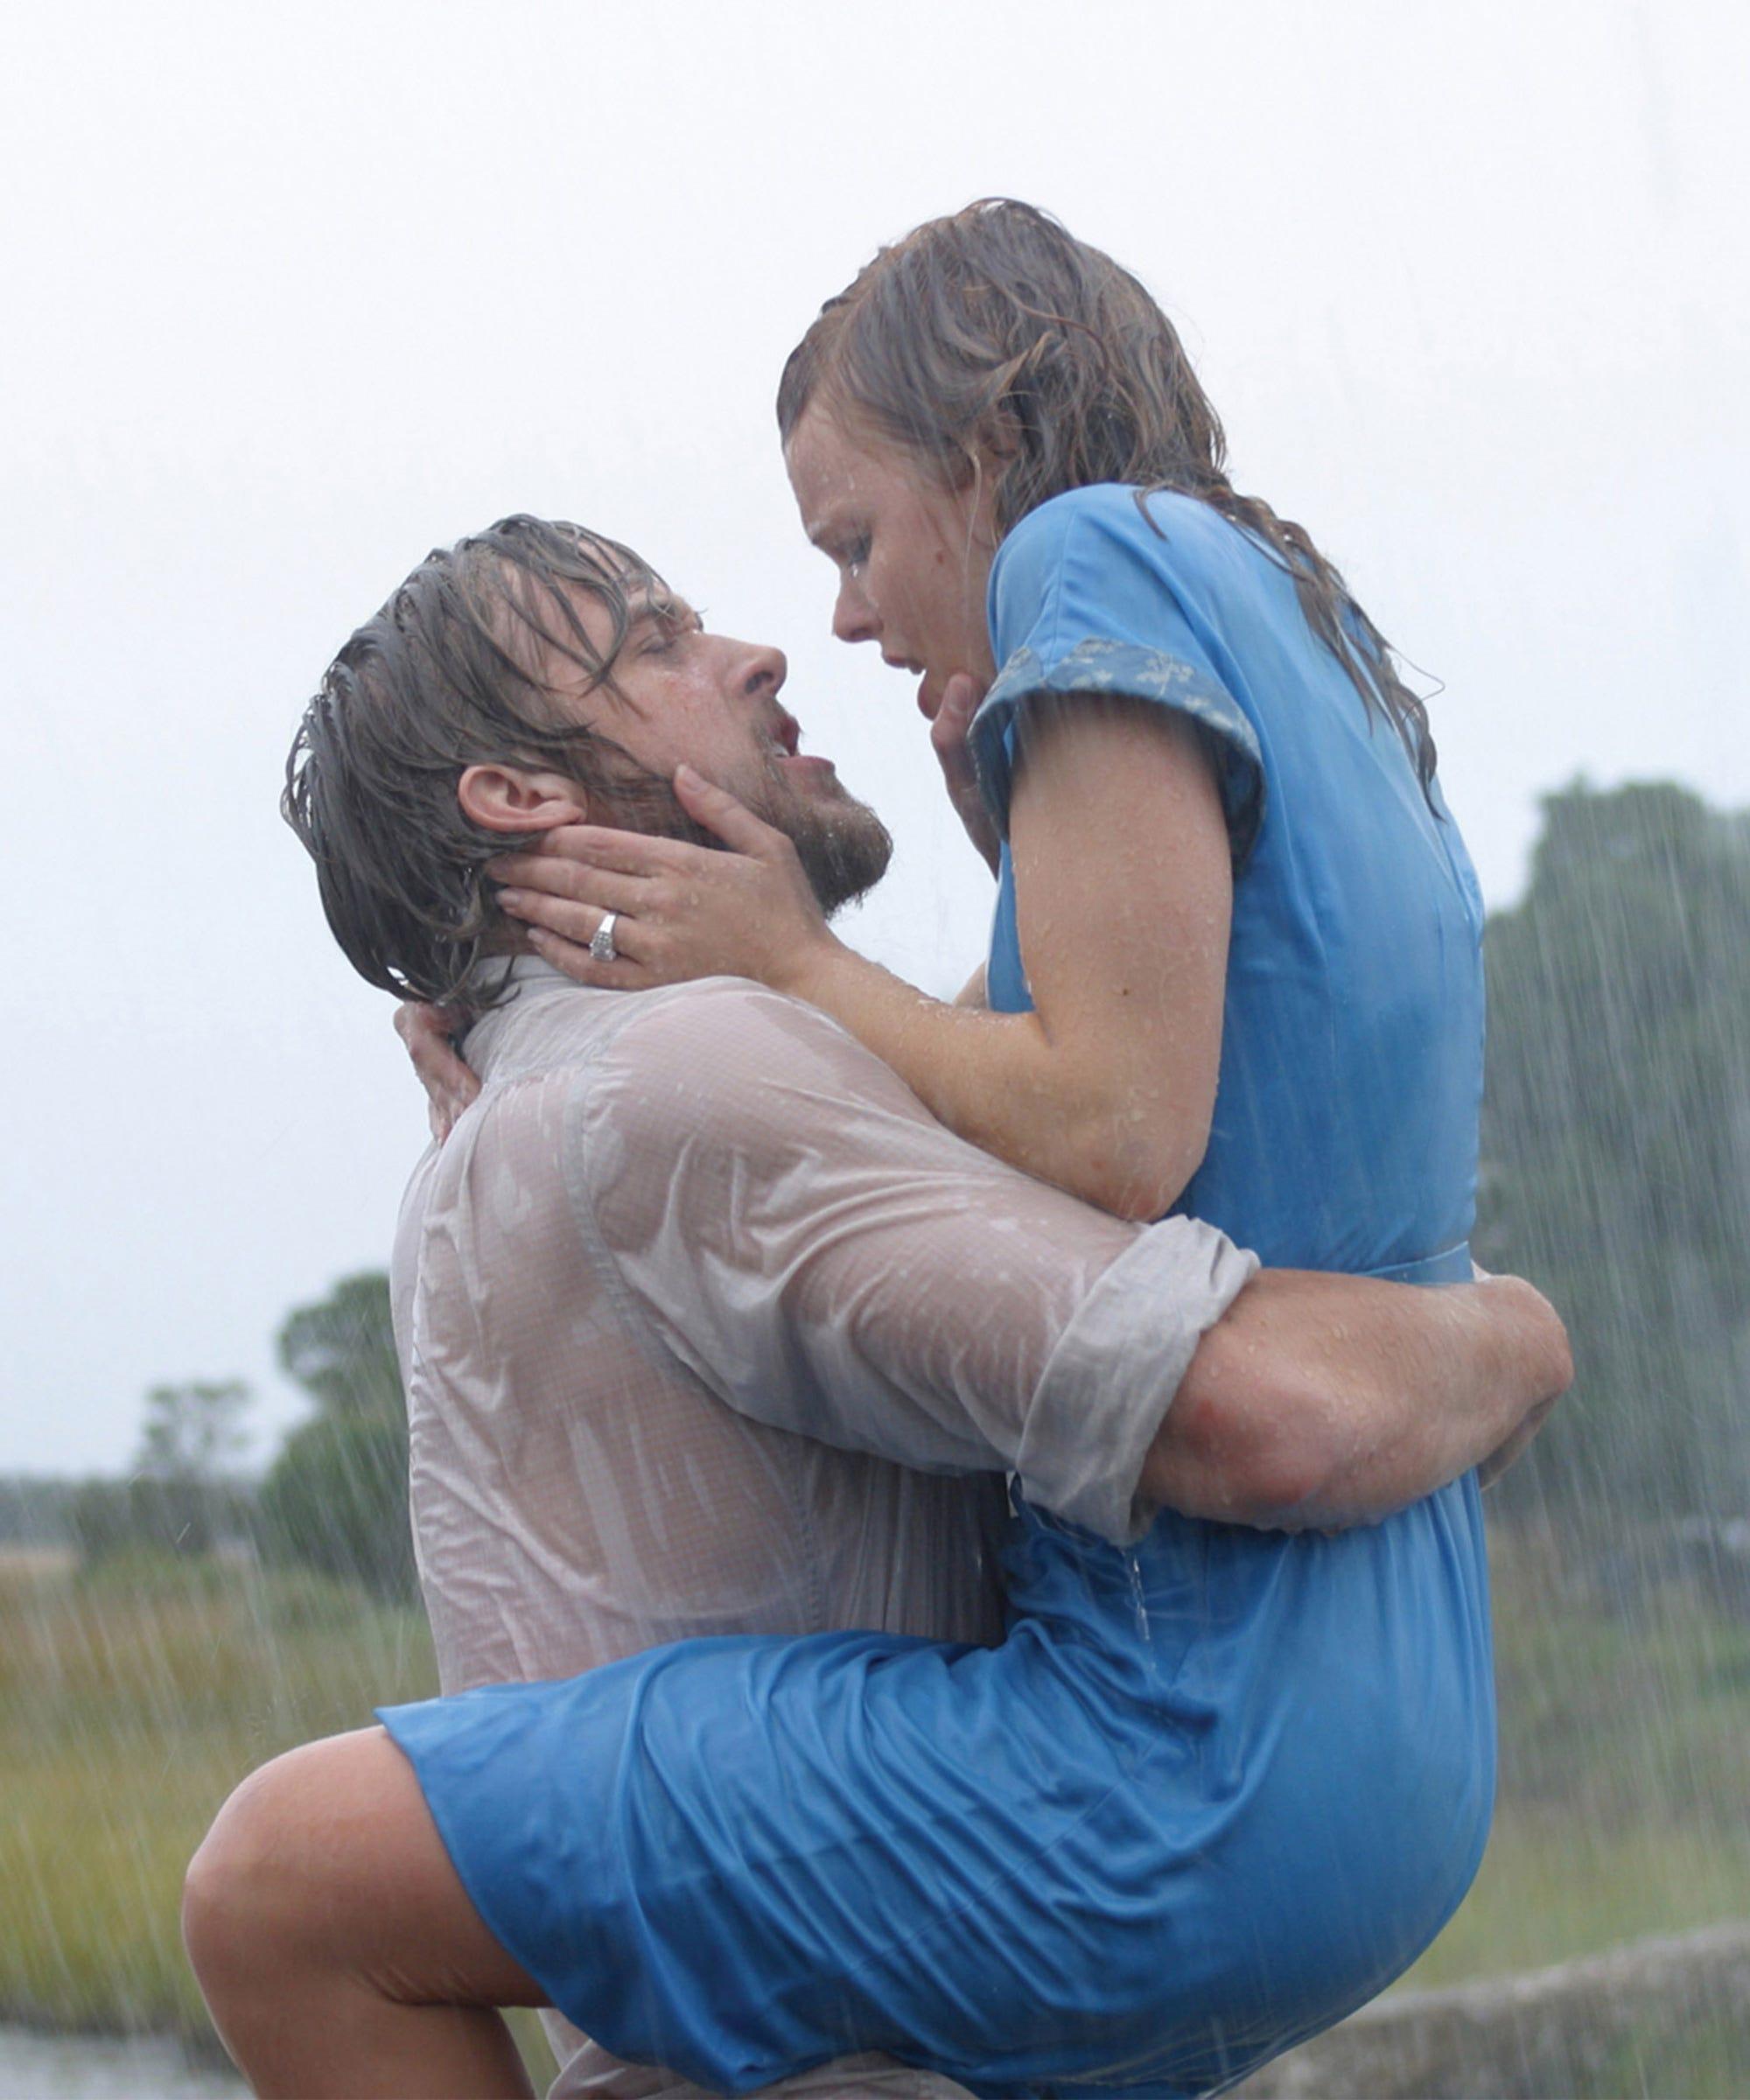 Best Rainy Day Movies To Watch On Netflix